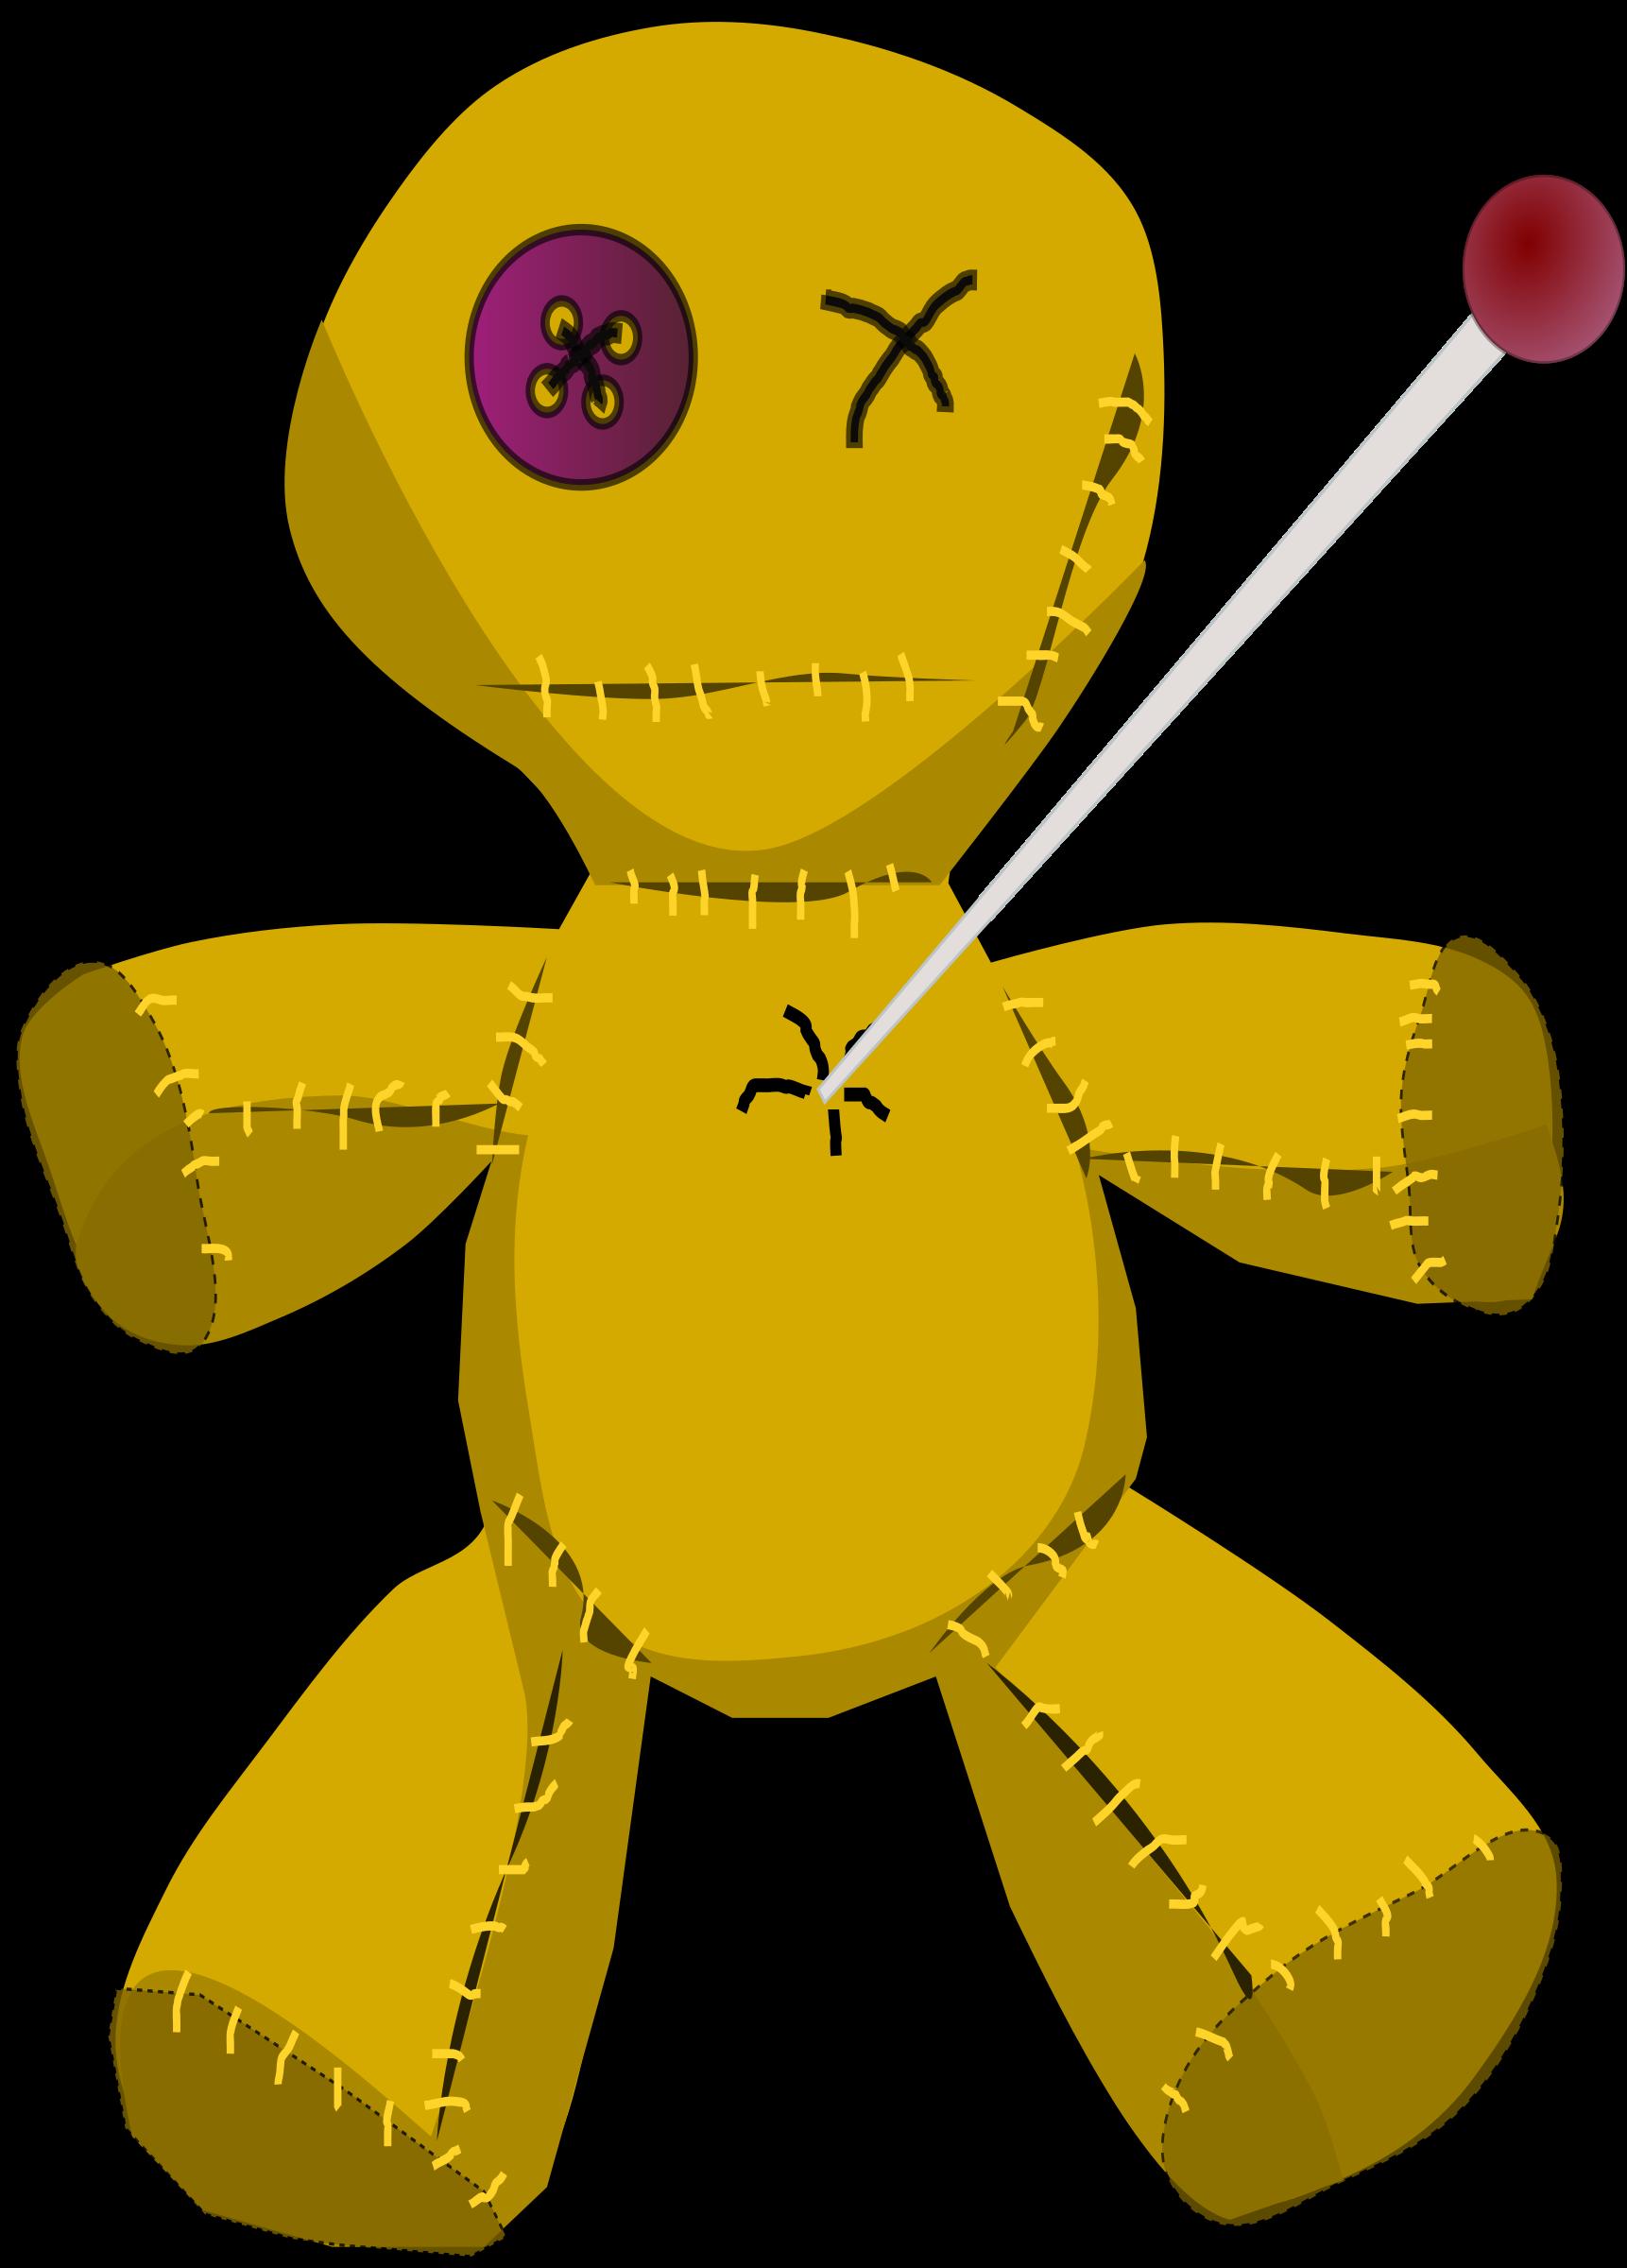 Voodoo clipart Clipart doll doll voodoo voodoo